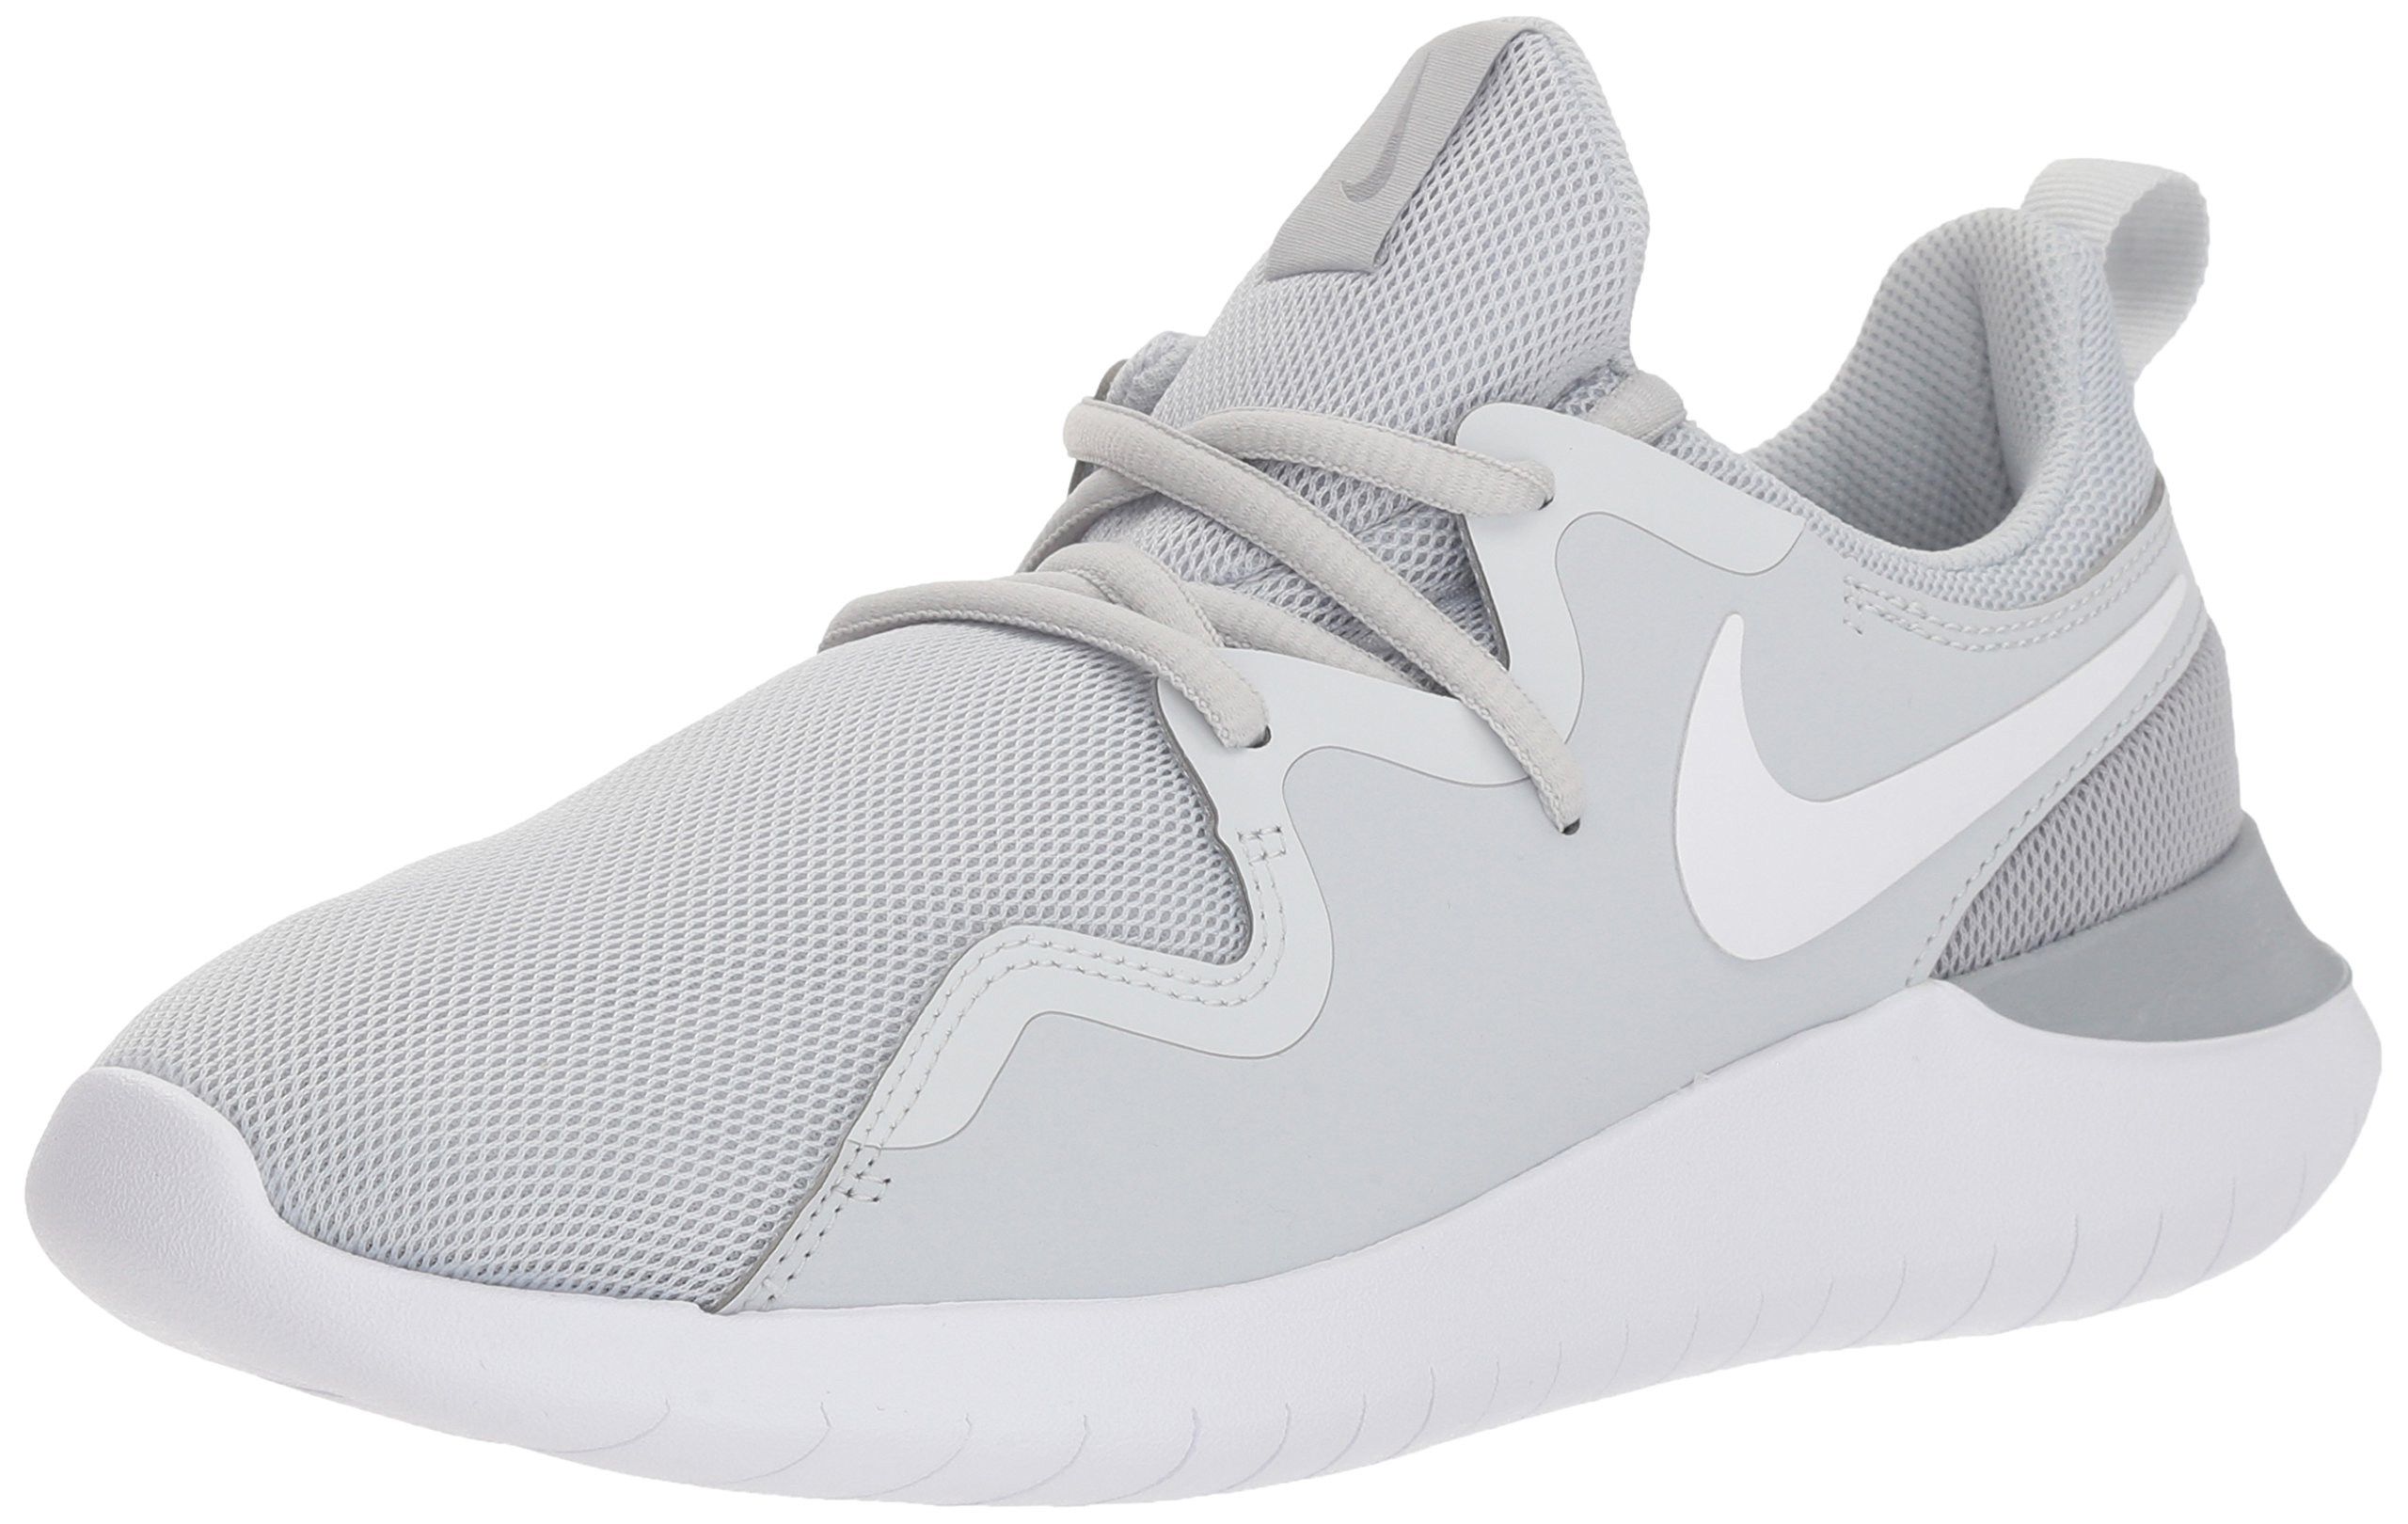 cheap for discount 1fde6 0048f Galleon - NIKE Women s Tessen Running Shoe, Pure Platinum White-Wolf Grey, 8  Regular US